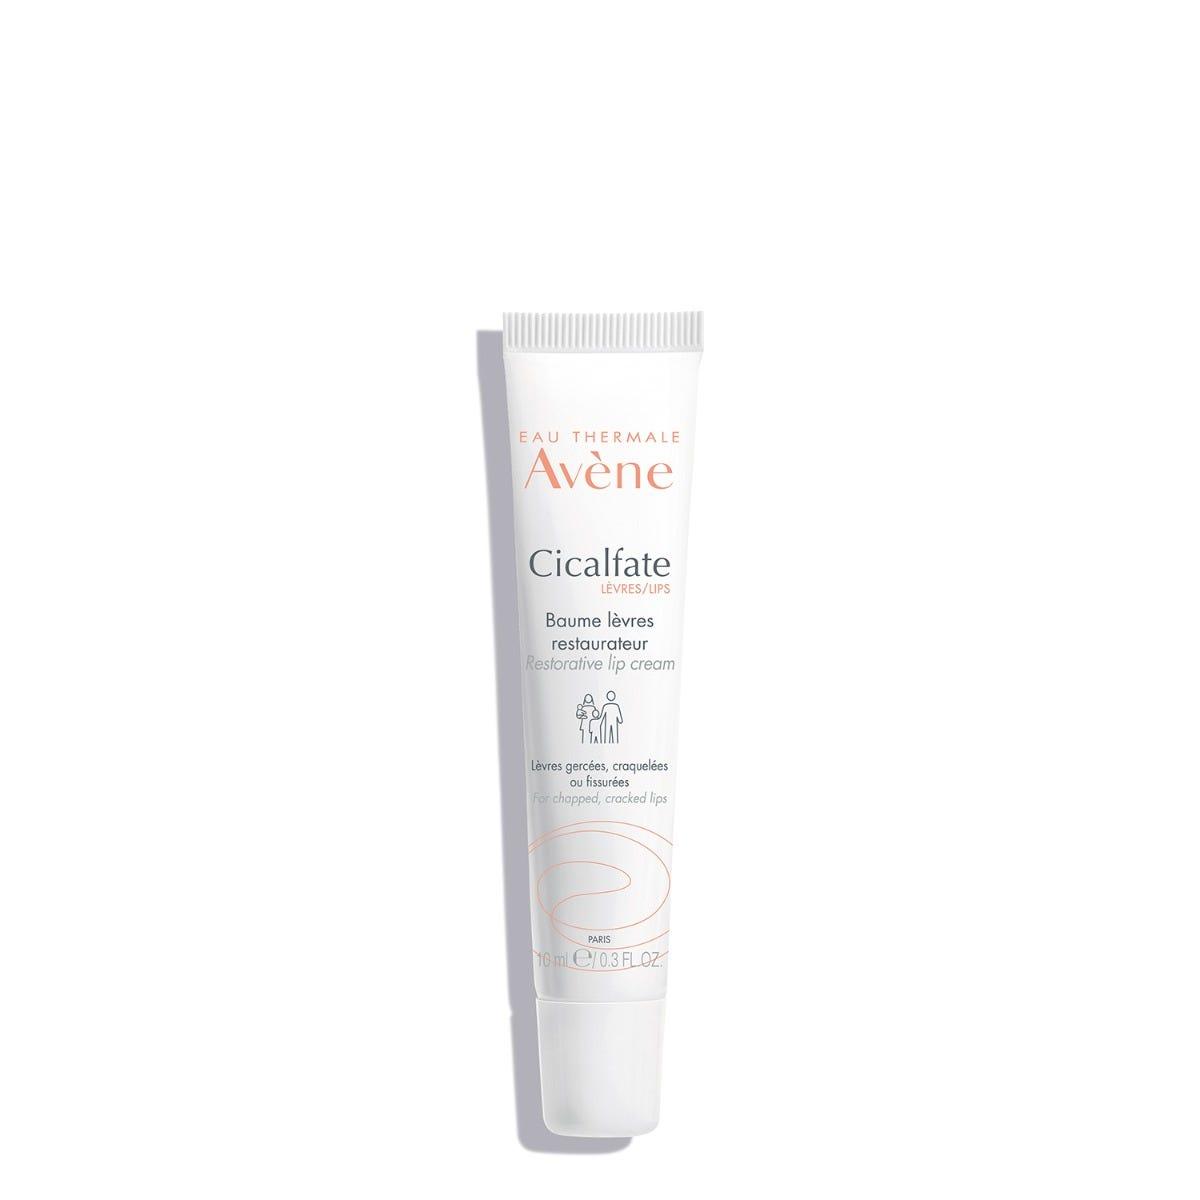 Avene cicalfate restorative lipcream 10ml 1500x1500 shadow